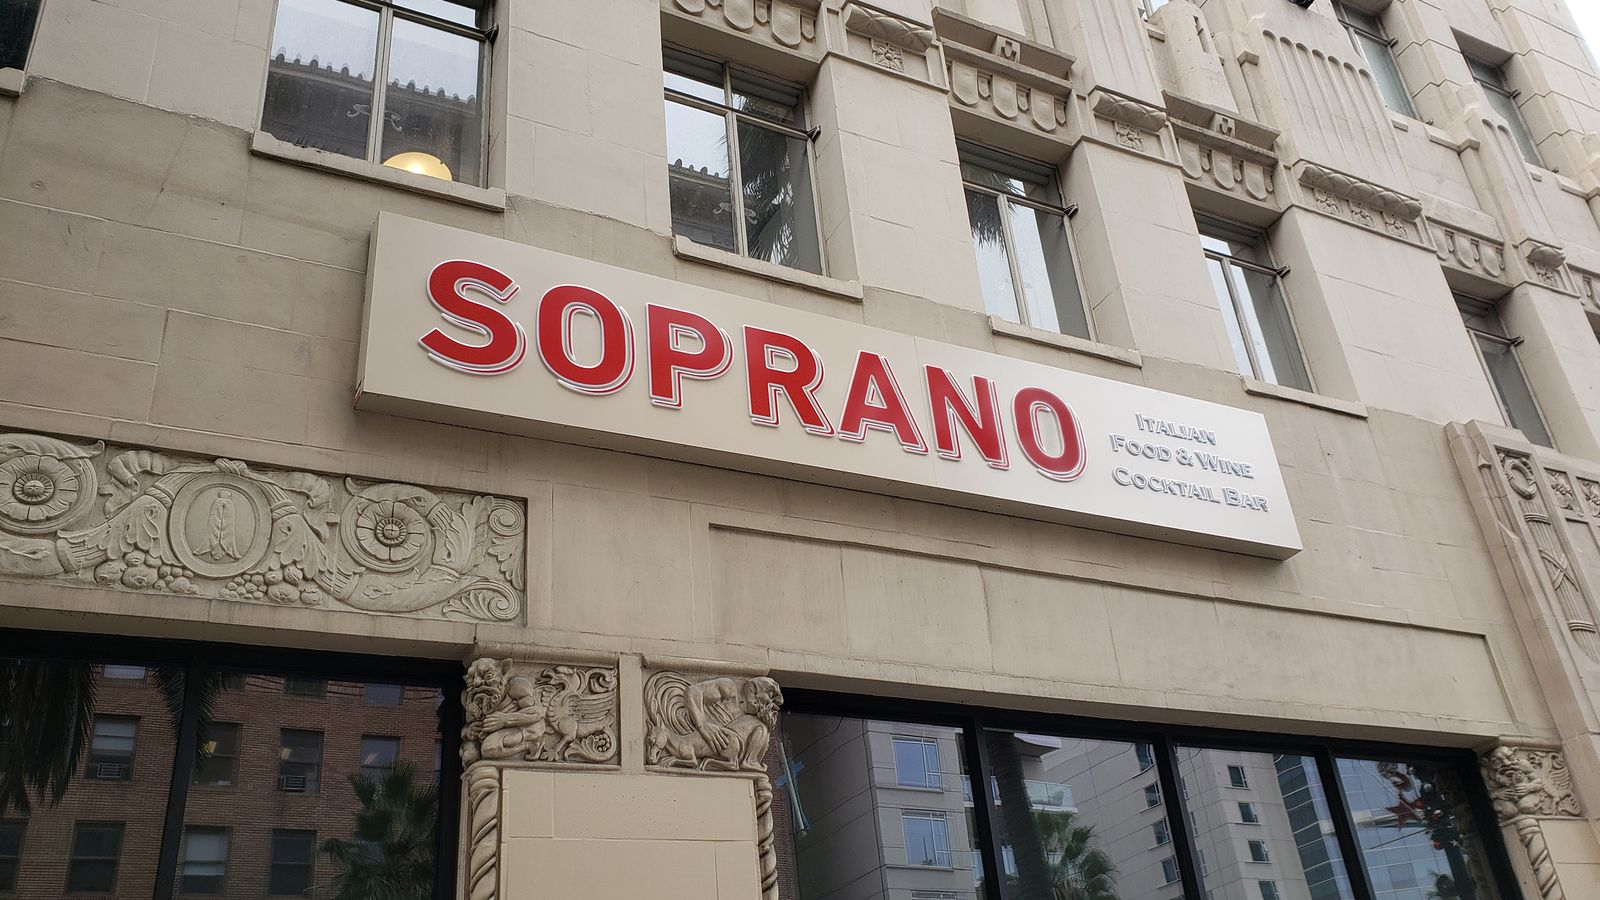 Soprano restaurant illuminated sign